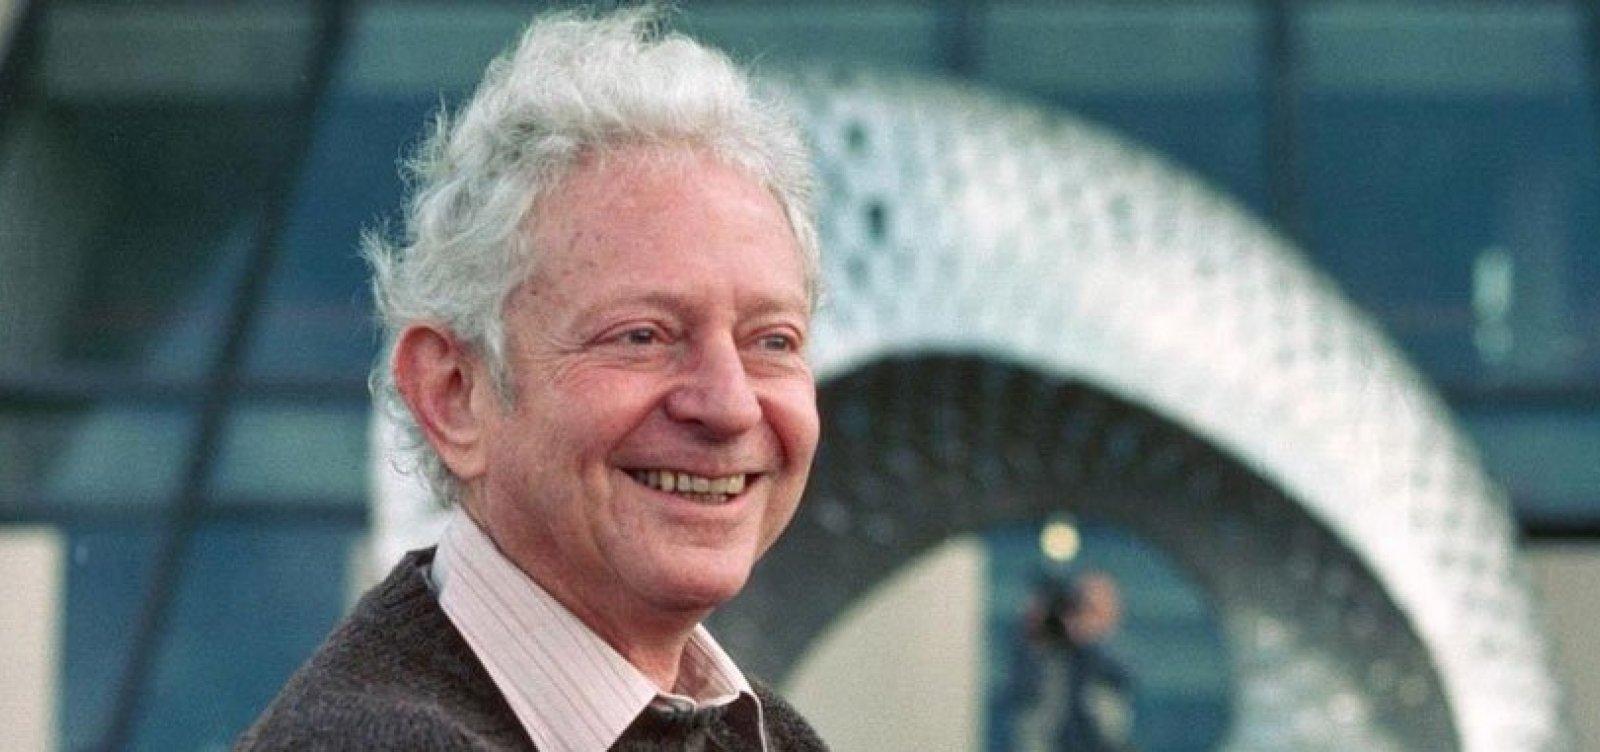 Aos 96 anos, morre o físico vencedor do Prêmio Nobel, Leon Lederman